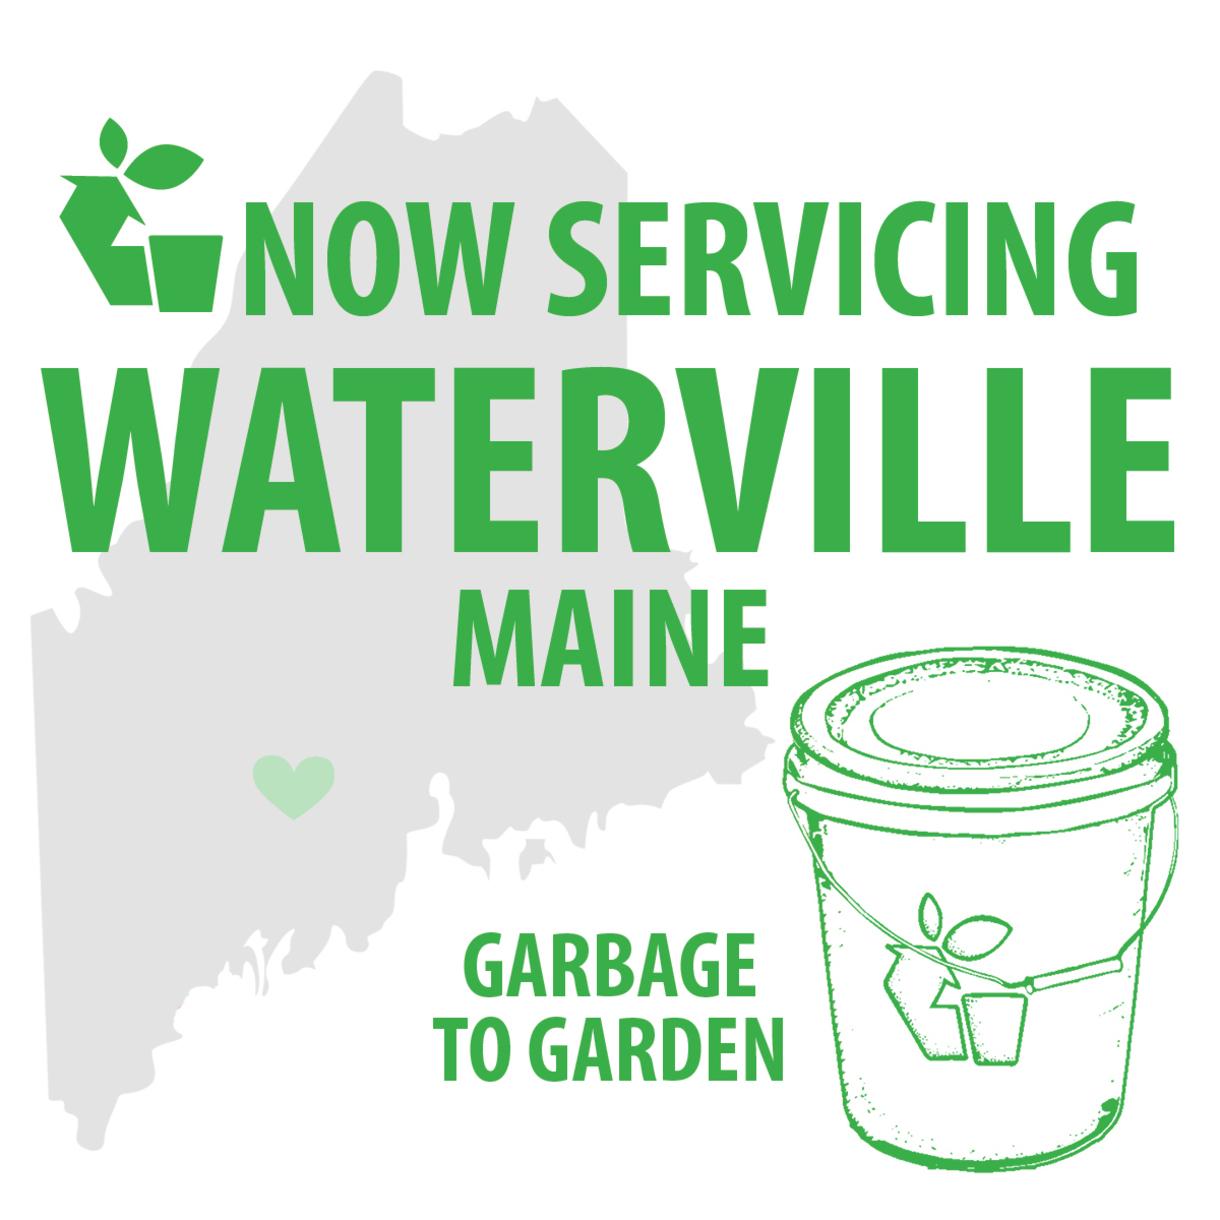 Garbage to Garden is now servicing Waterville, Maine